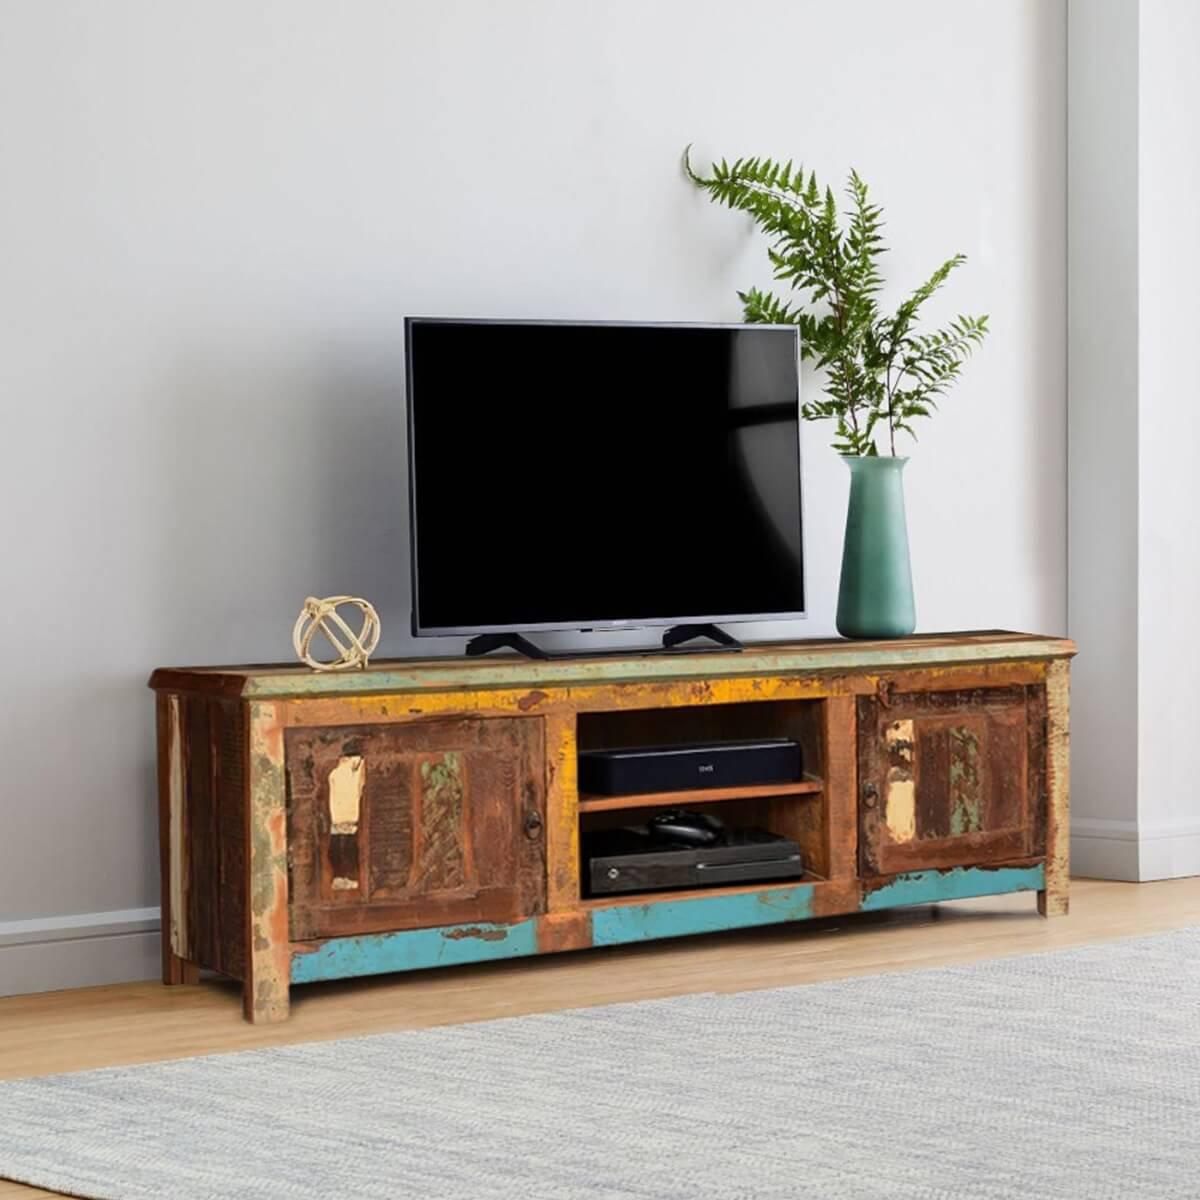 Bienville Retro Style Reclaimed Wood Media TV Stand 2 Door Cabinet